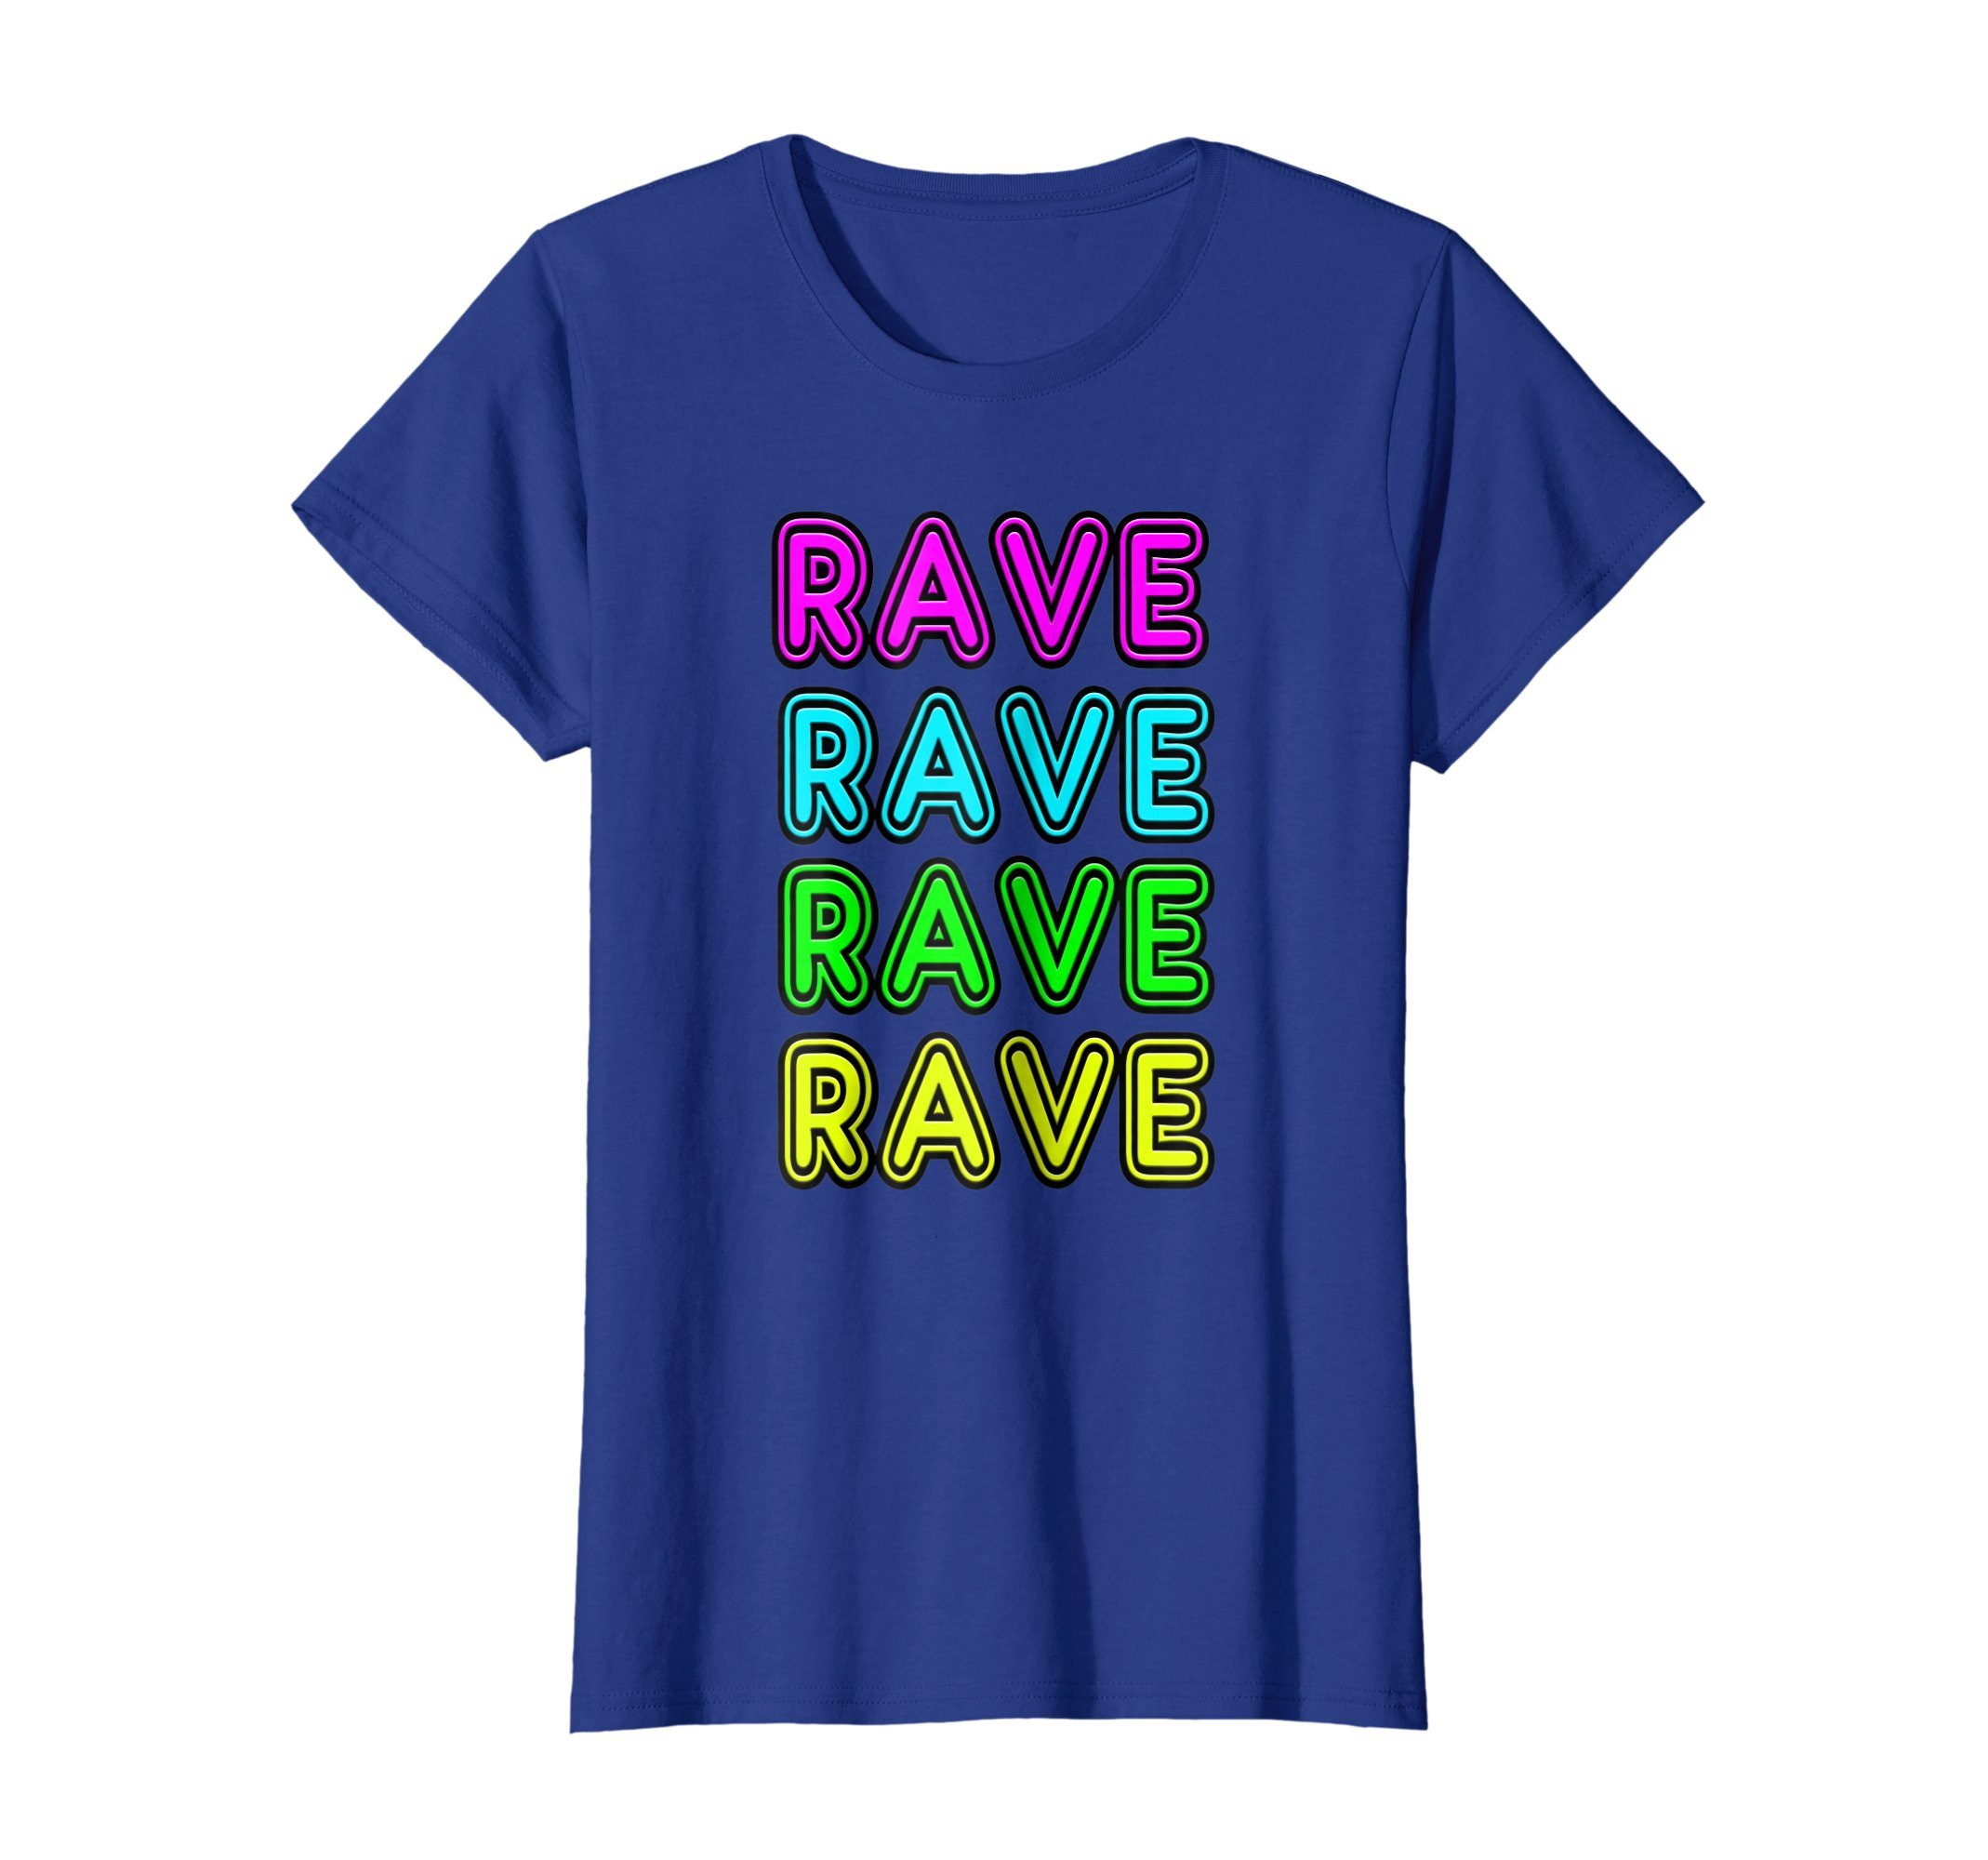 Womens Neon Sign Style RAVE EDM, Trap, Dubstep, Raver Gift T-Shirt XL Royal Blue